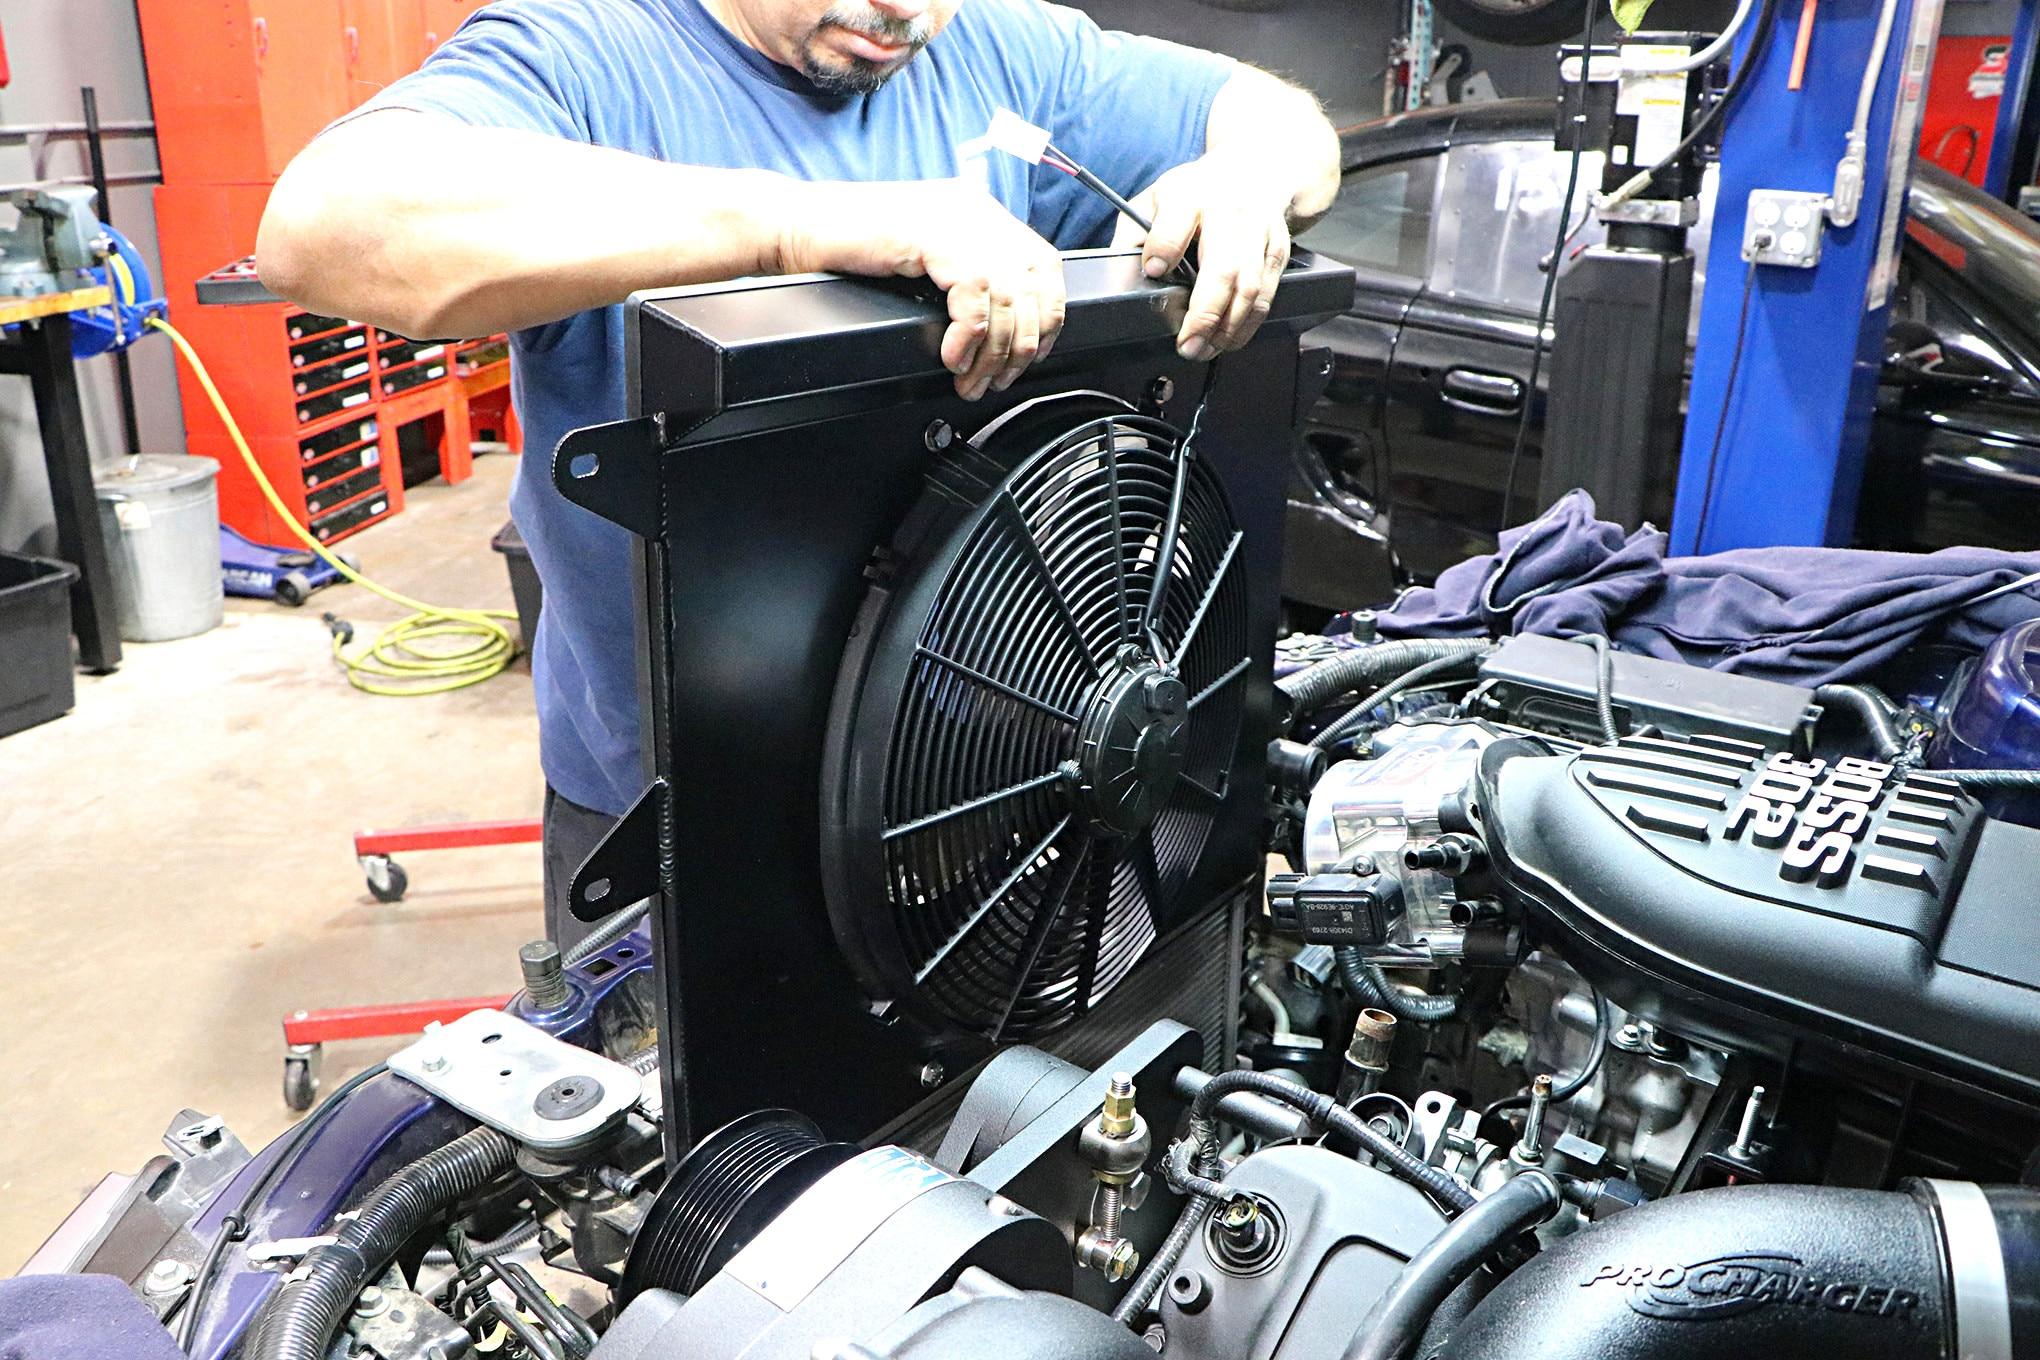 018 Mustang Procharger Radiator Cooling Fan